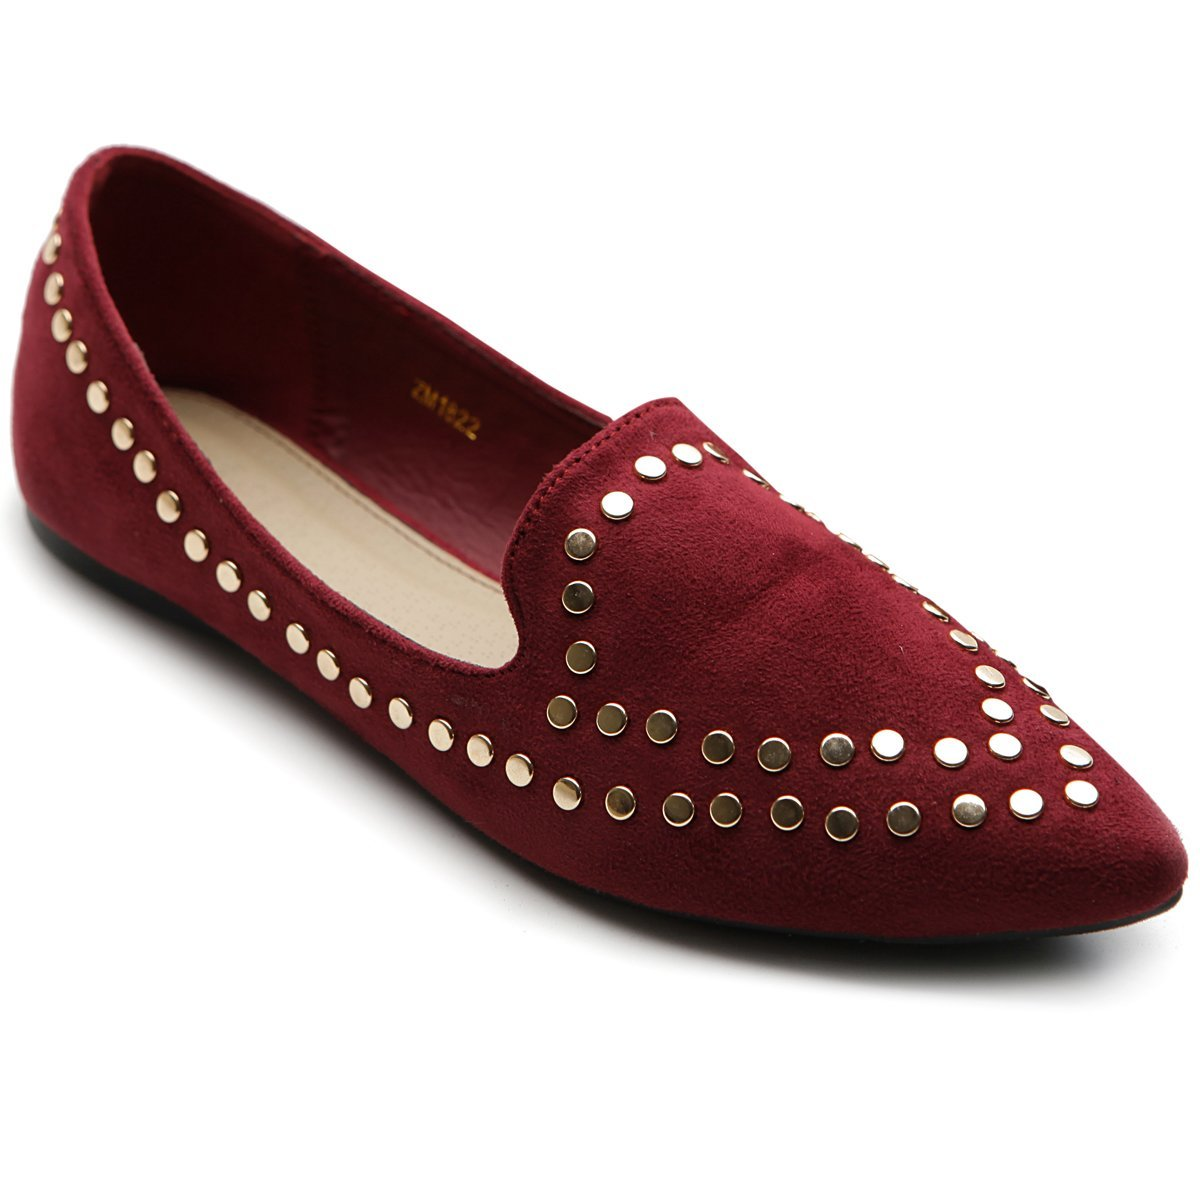 Ollio Women's Ballet Shoe Comfort Faux-Suede Studded B00HDOTFZ2 Flat(5.5 B(M) US, Burgundy) B00HDOTFZ2 Studded 6.5 B(M) US|Burgundy 1ae42a